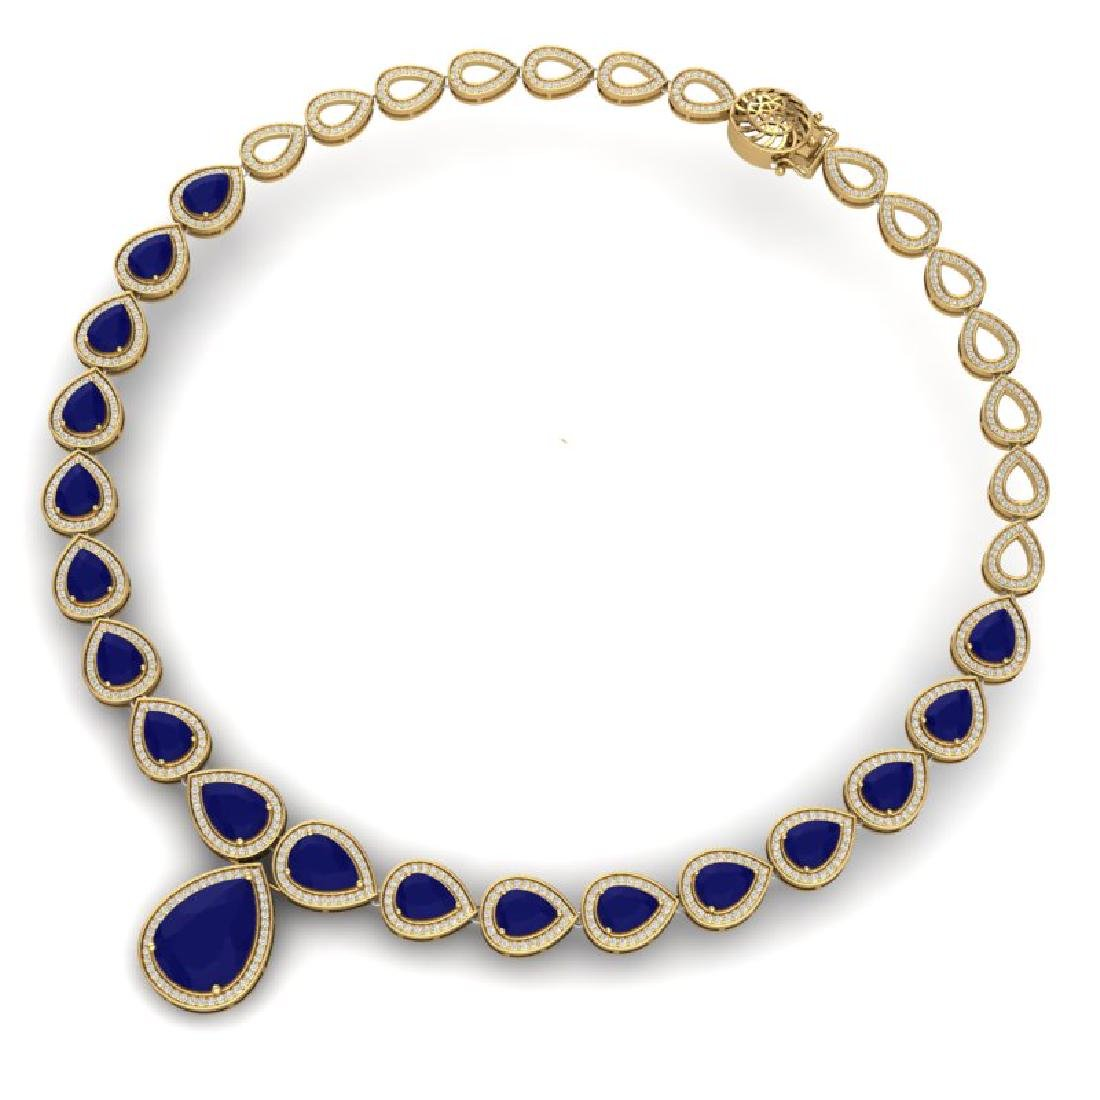 51.41 CTW Royalty Sapphire & VS Diamond Necklace 18K - 3